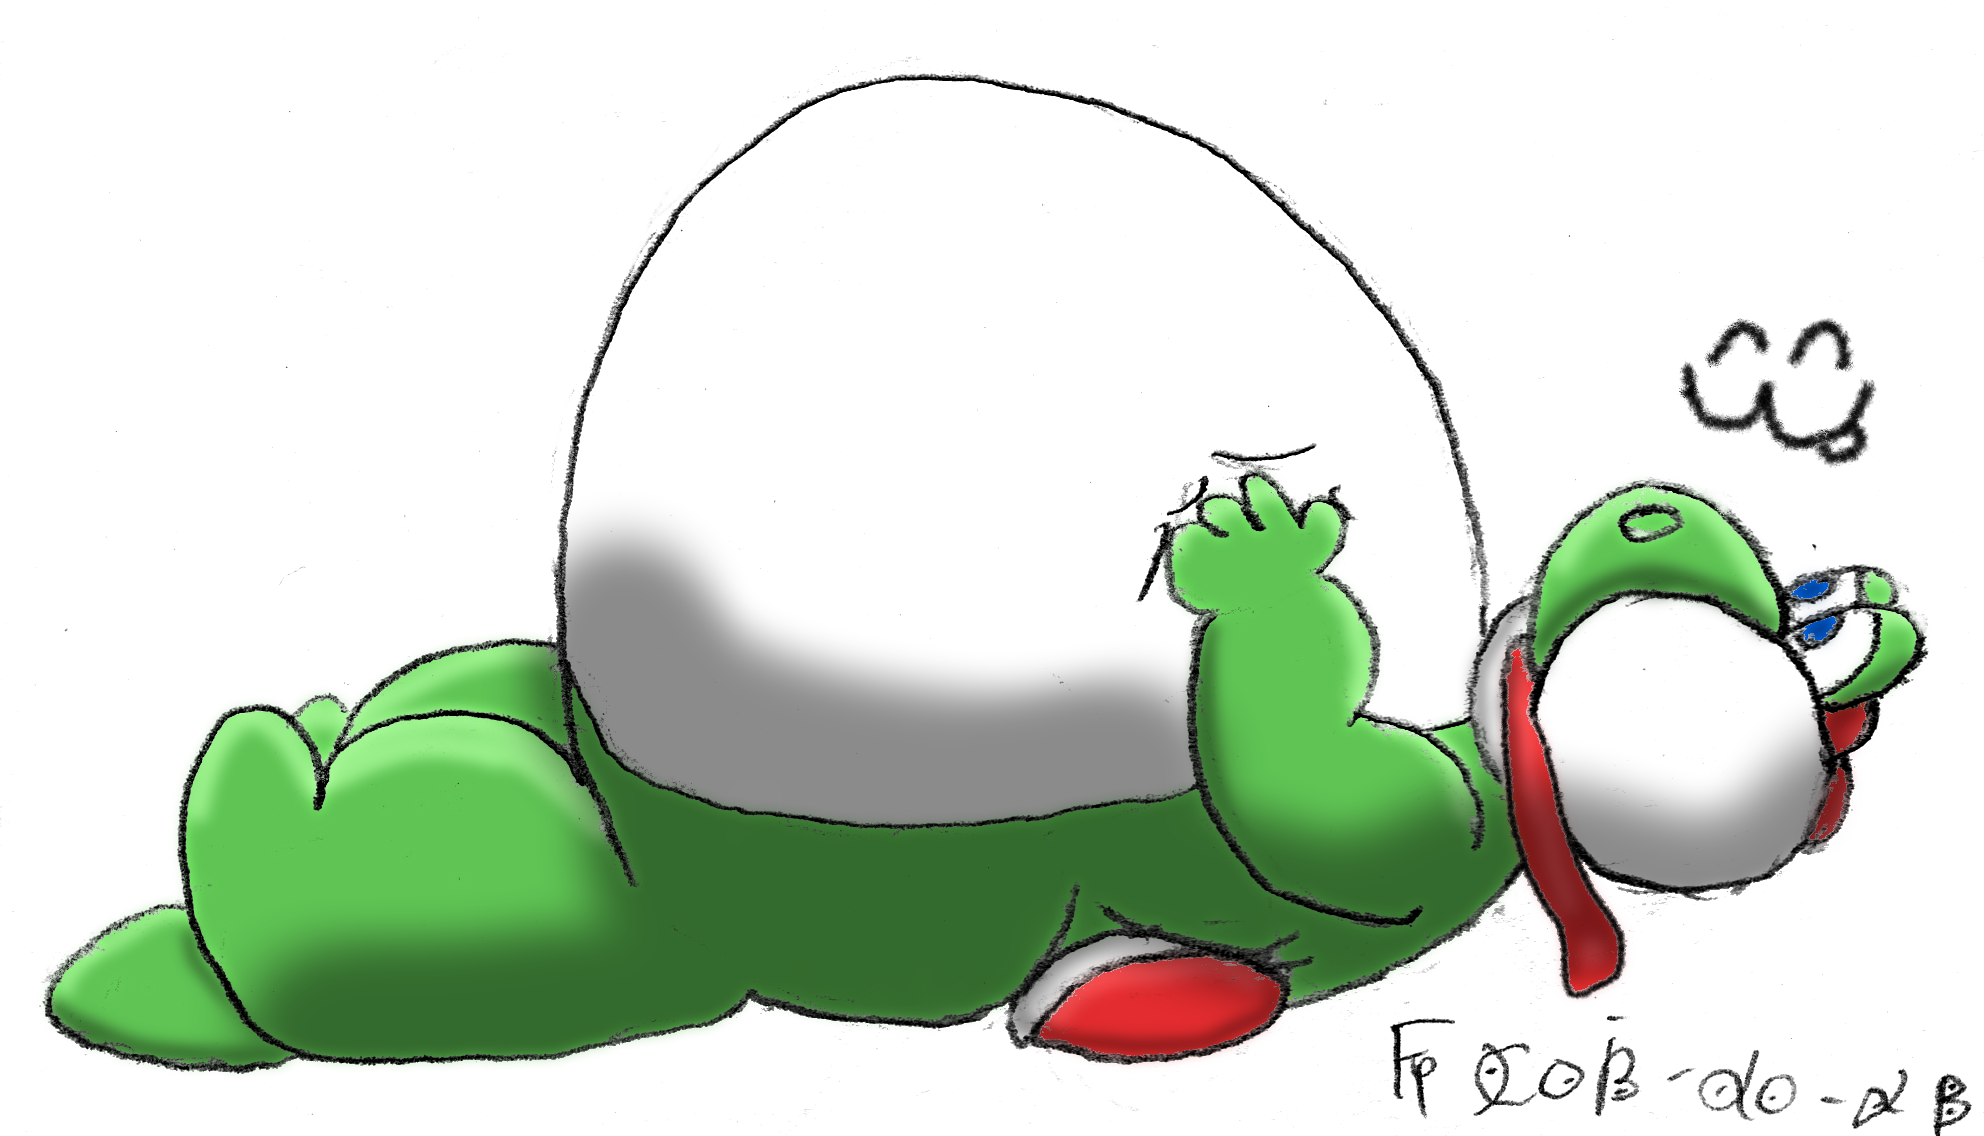 [Comic] Yoshi's surprise 3 of 3 by fatty-piggy